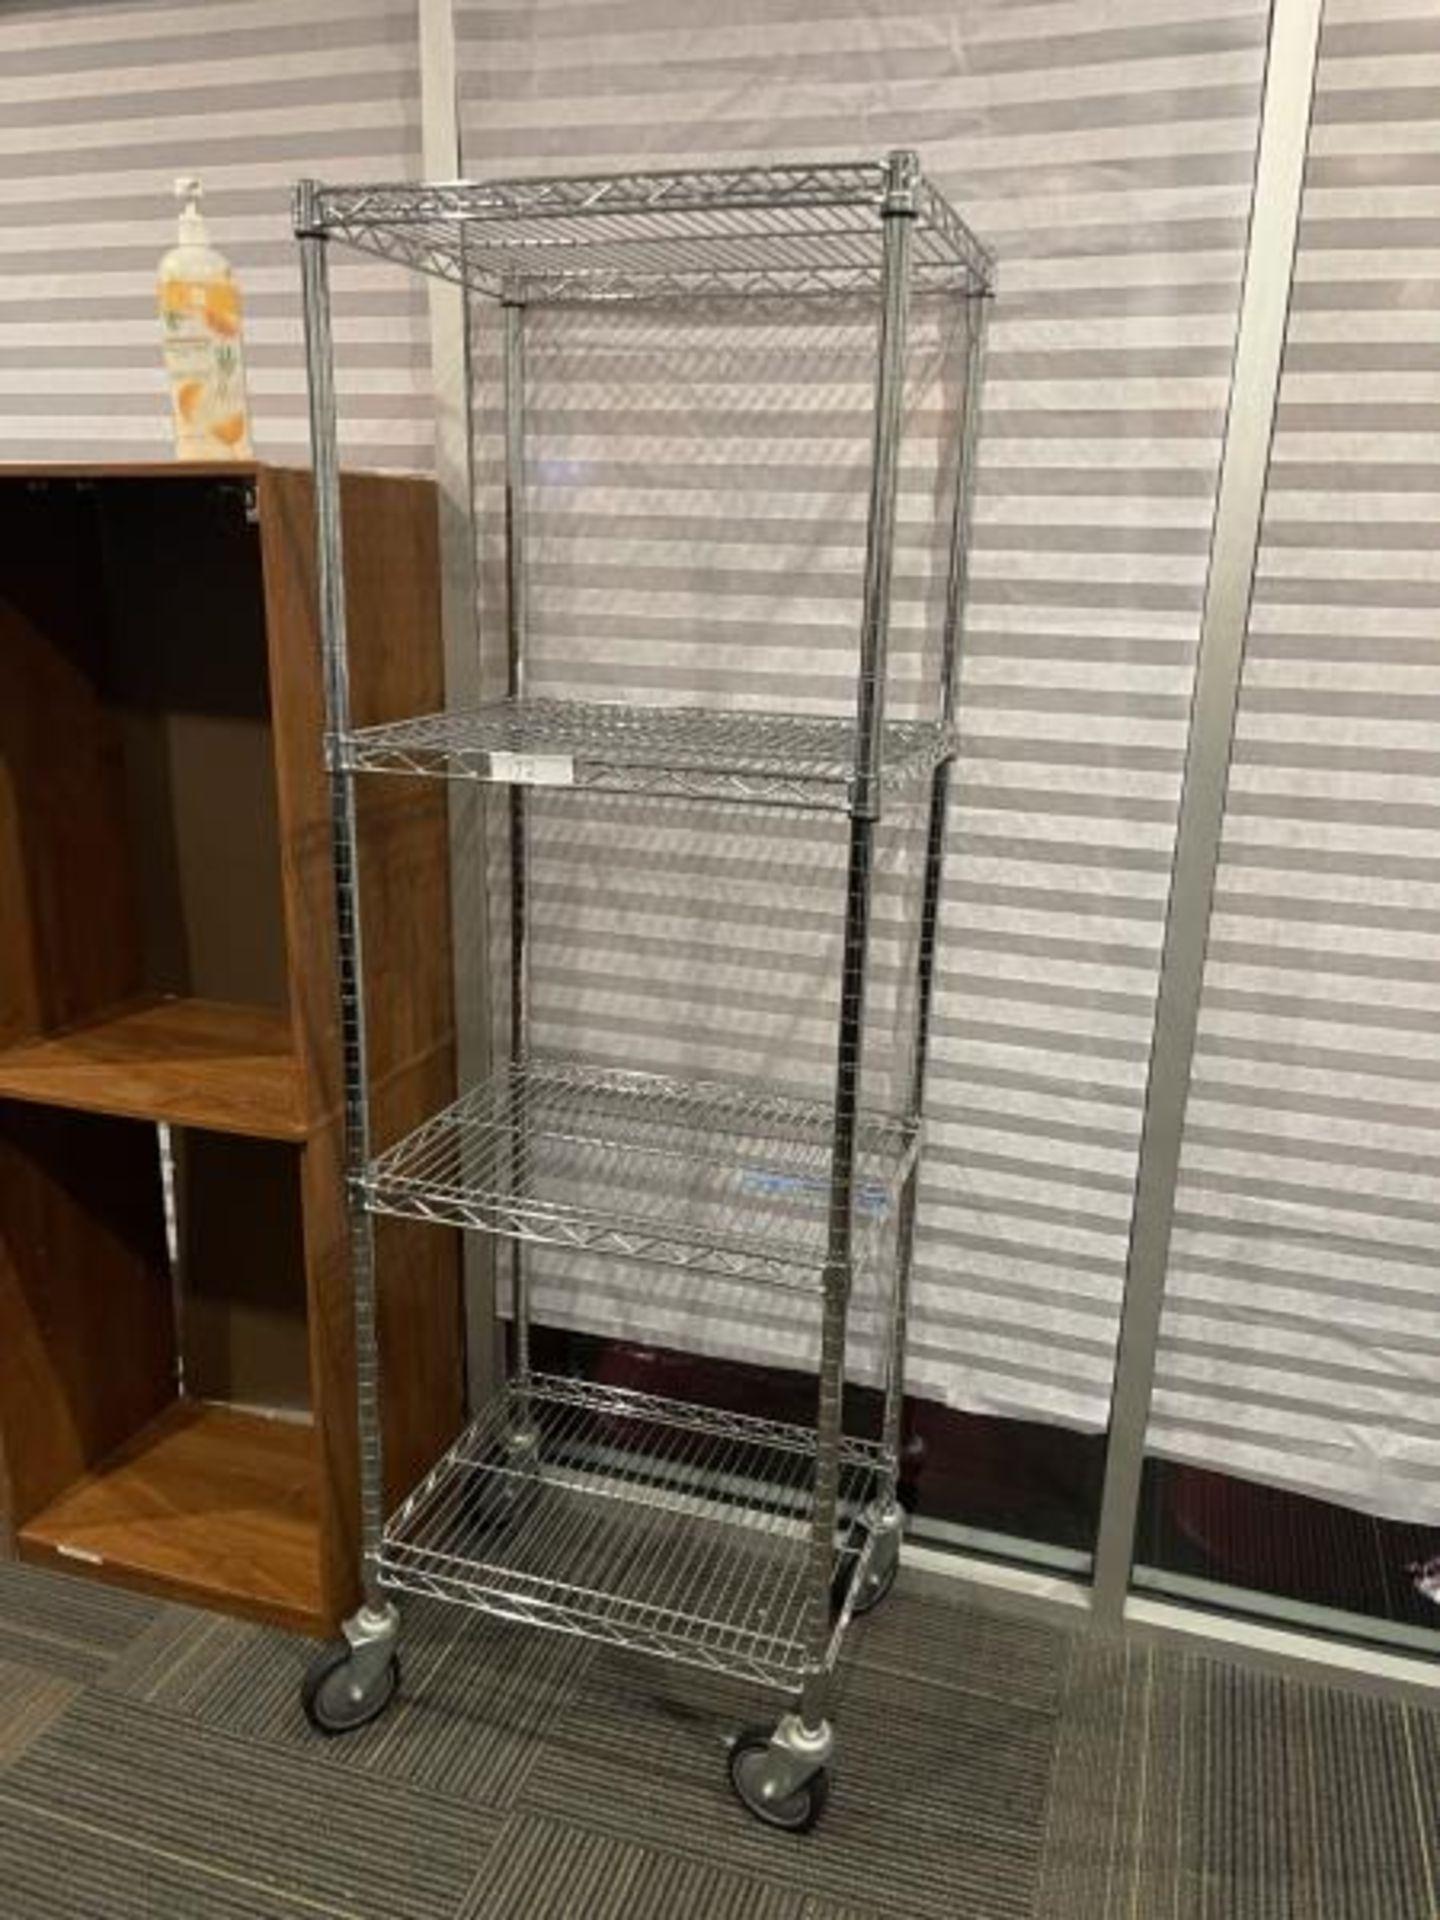 Lot of 4 Metal Wire Shelf on Casters, 2'x2'x6'